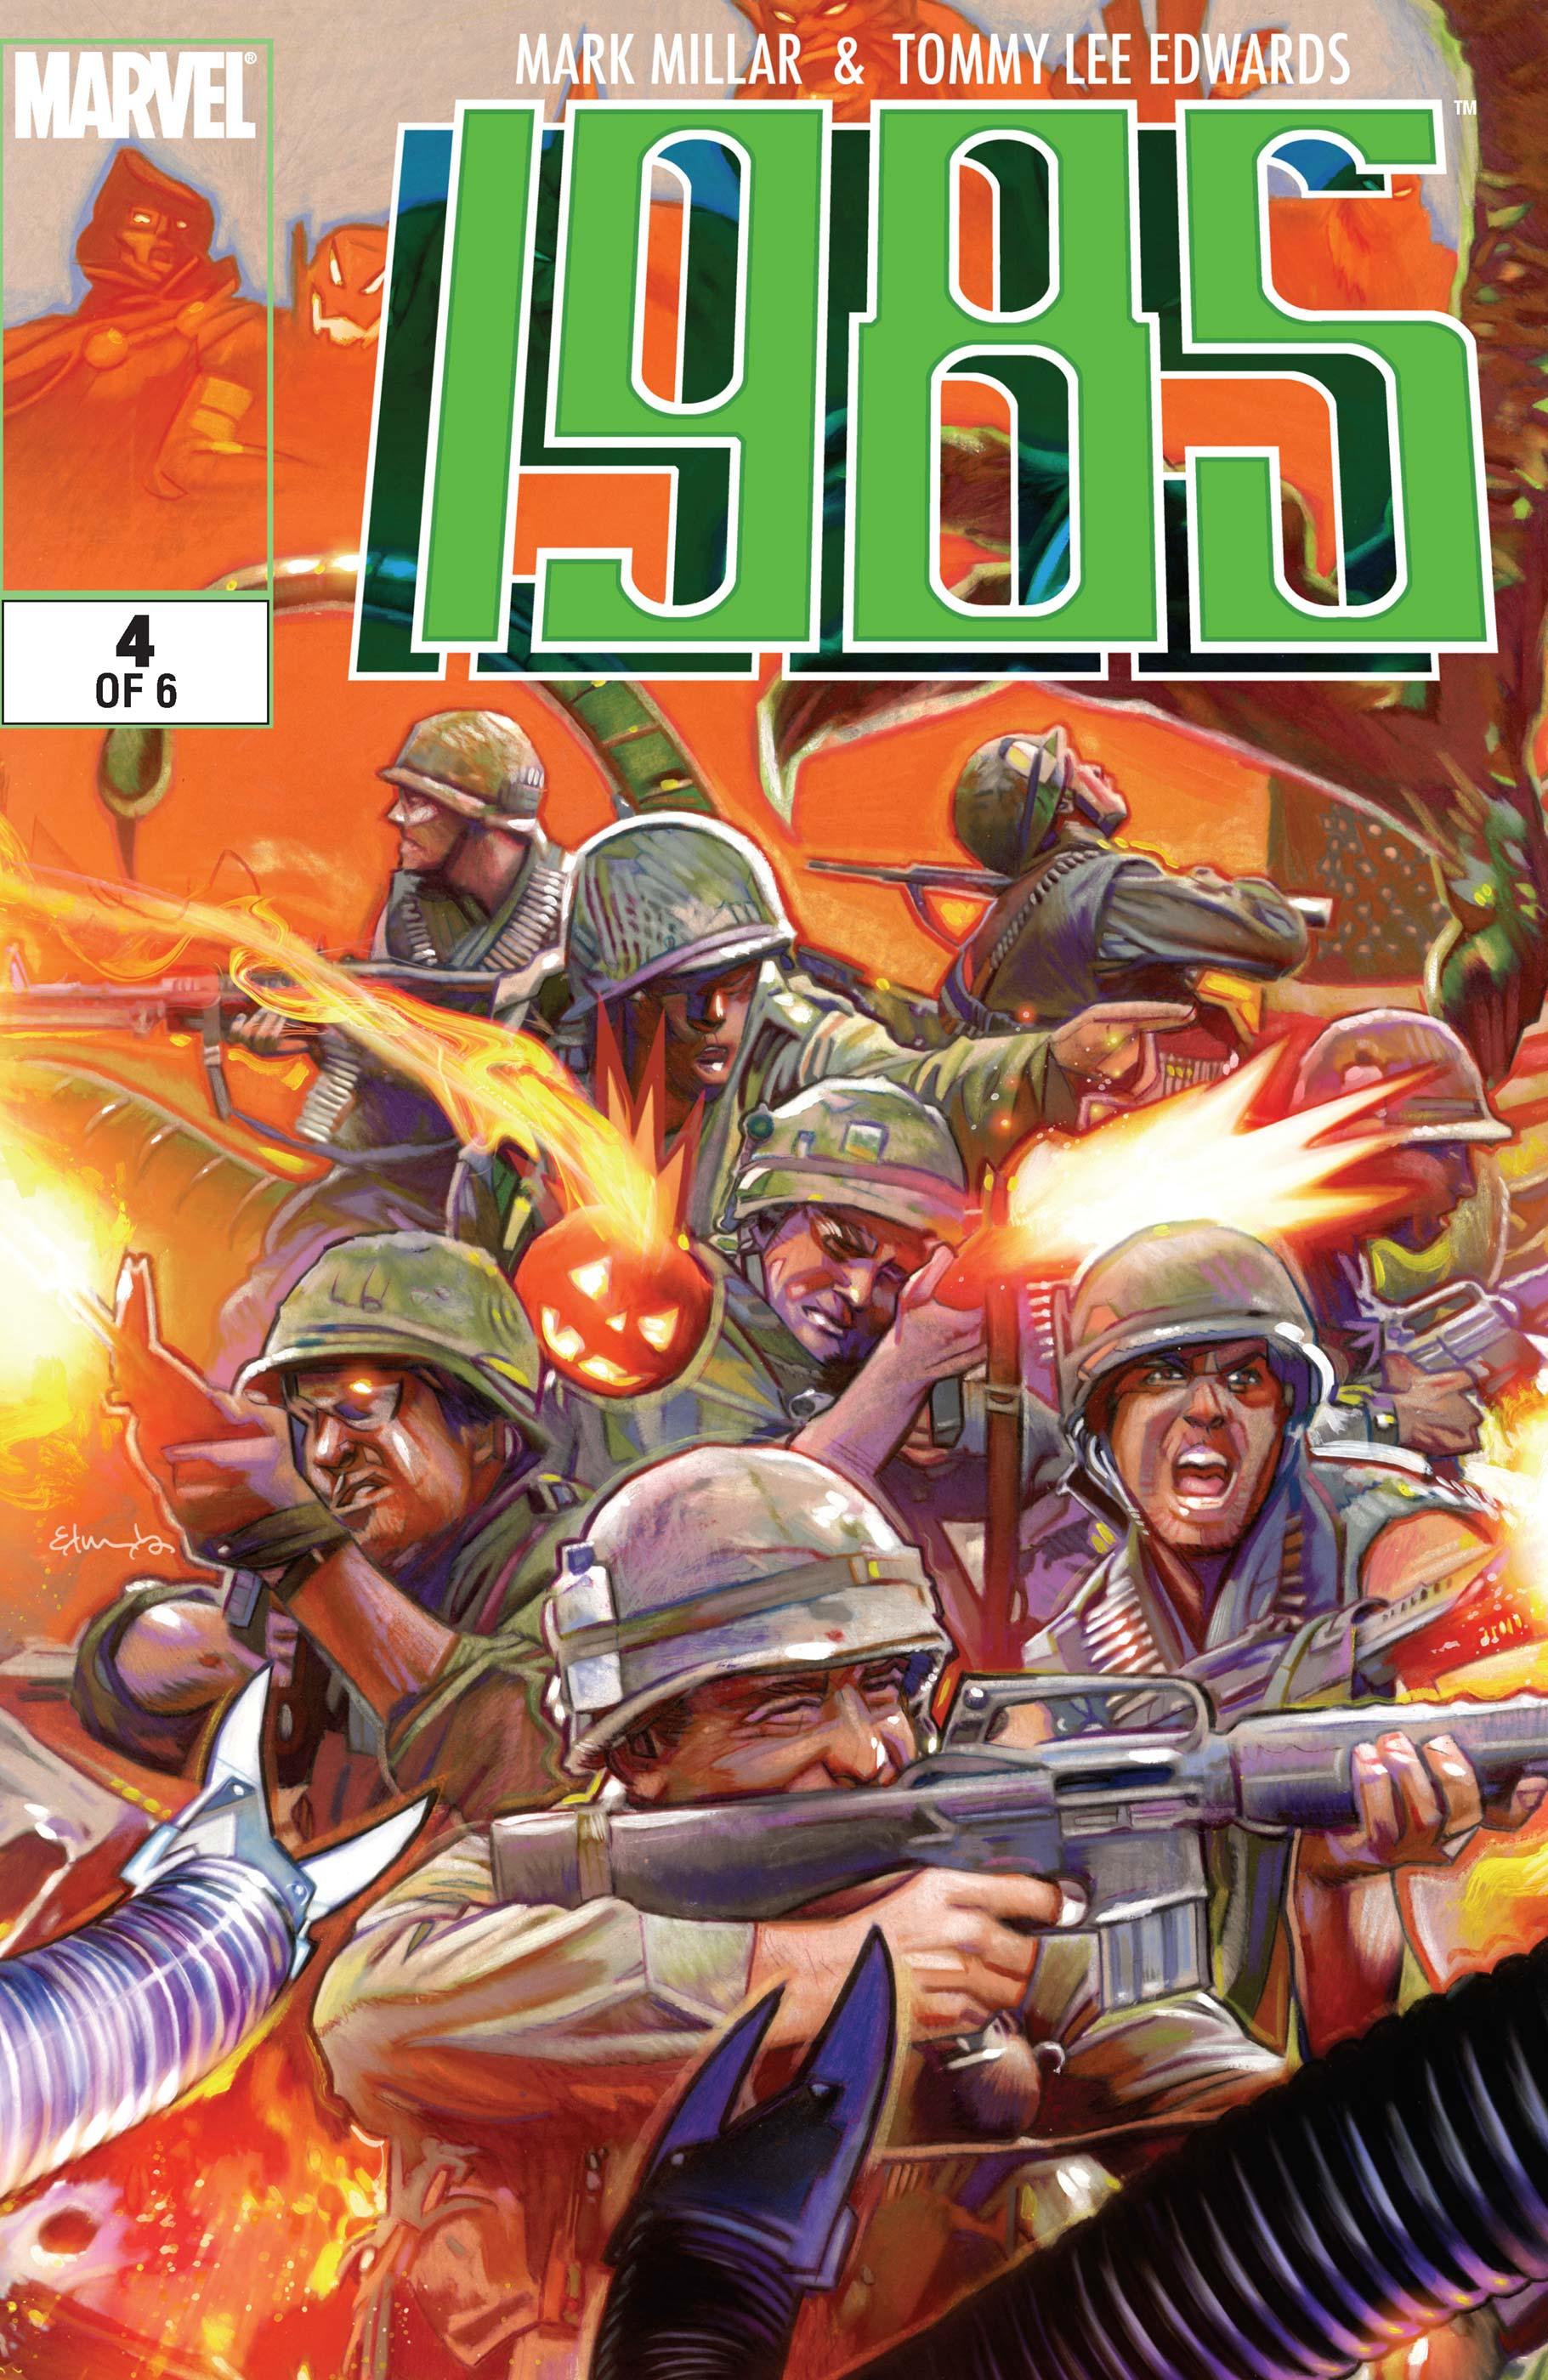 Marvel 1985 (2008) #4